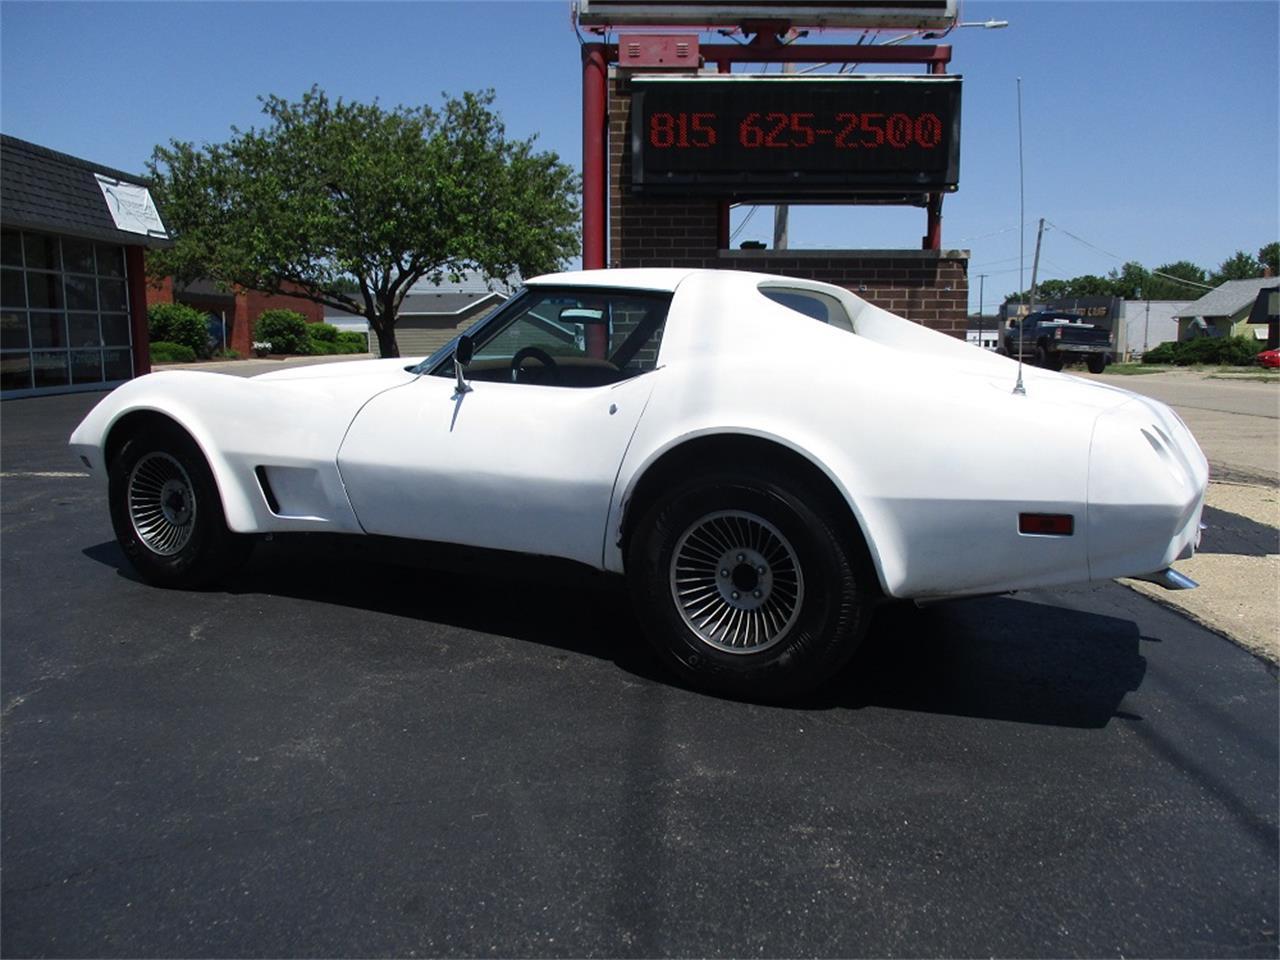 1974 Chevrolet Corvette Stingray (CC-1357031) for sale in Sterling, Illinois